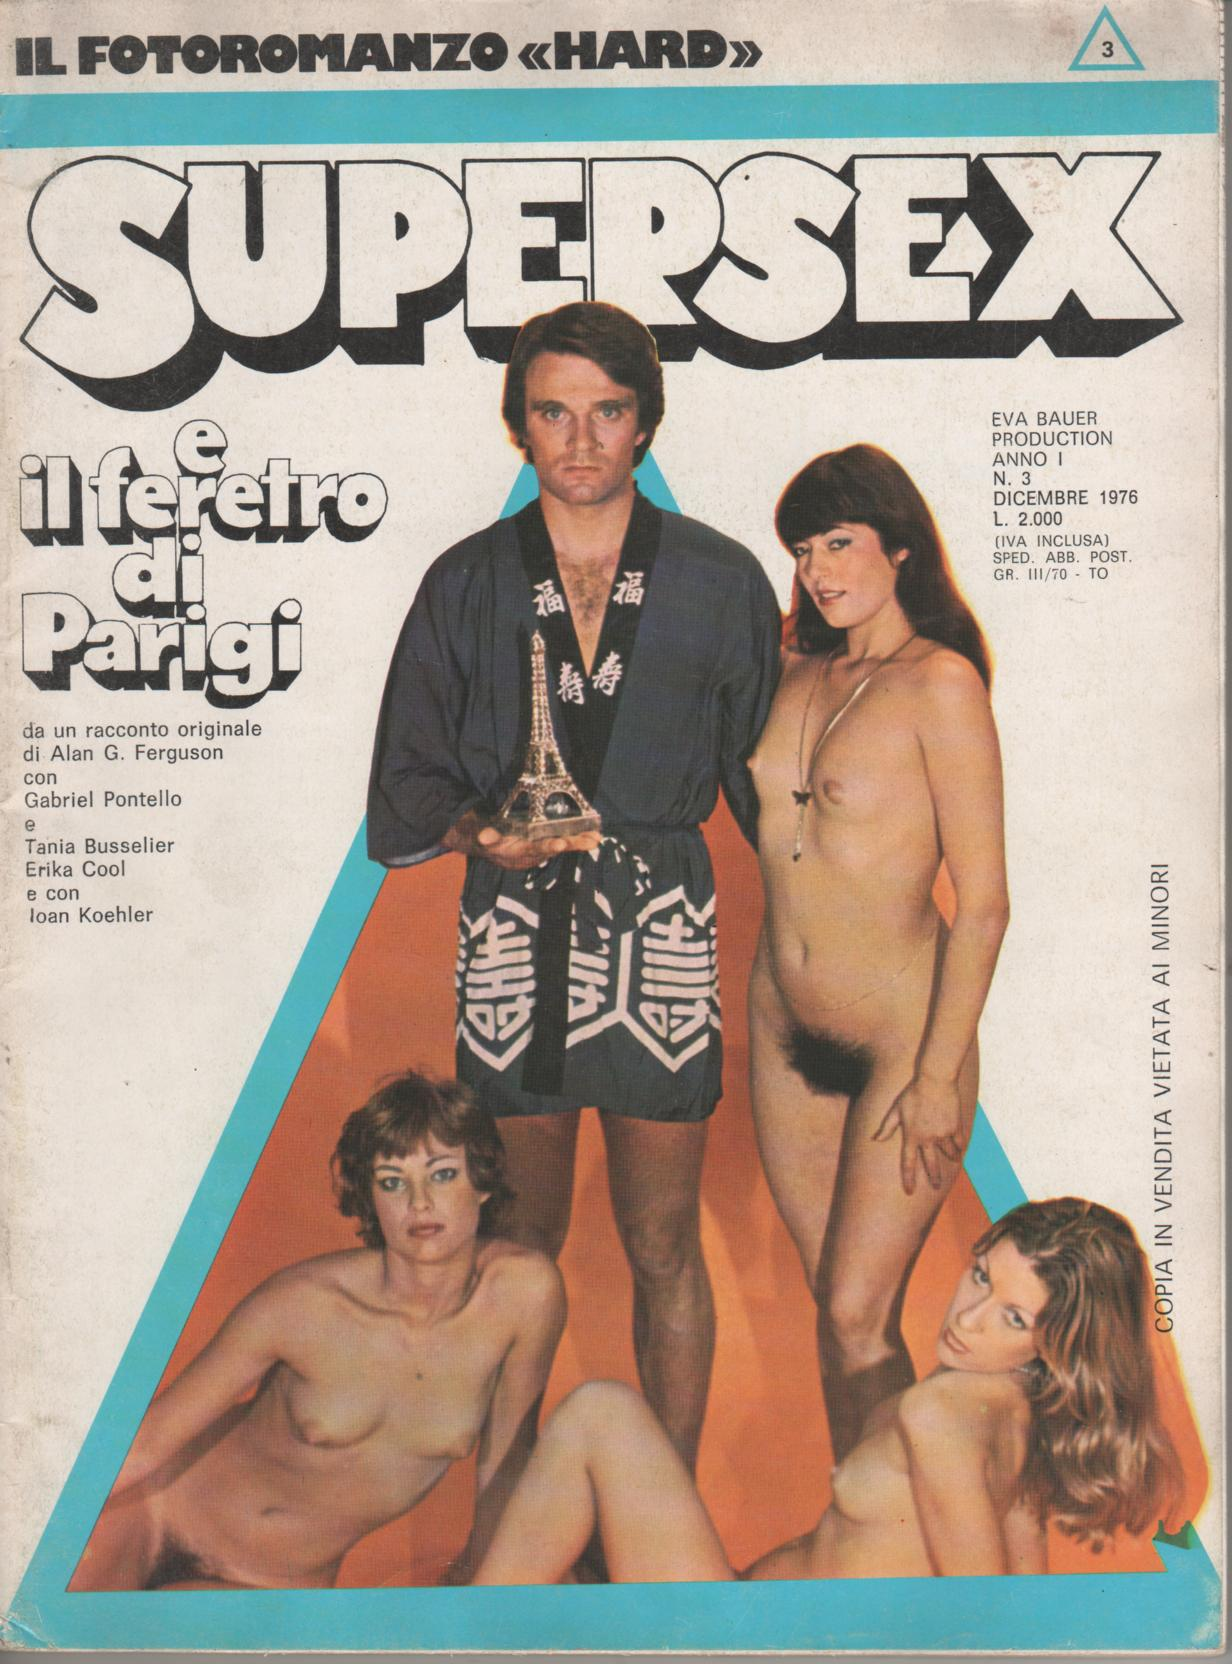 SUPERSEX  N. 3    SUPERSEX E IL FERETRO DI PARIGI